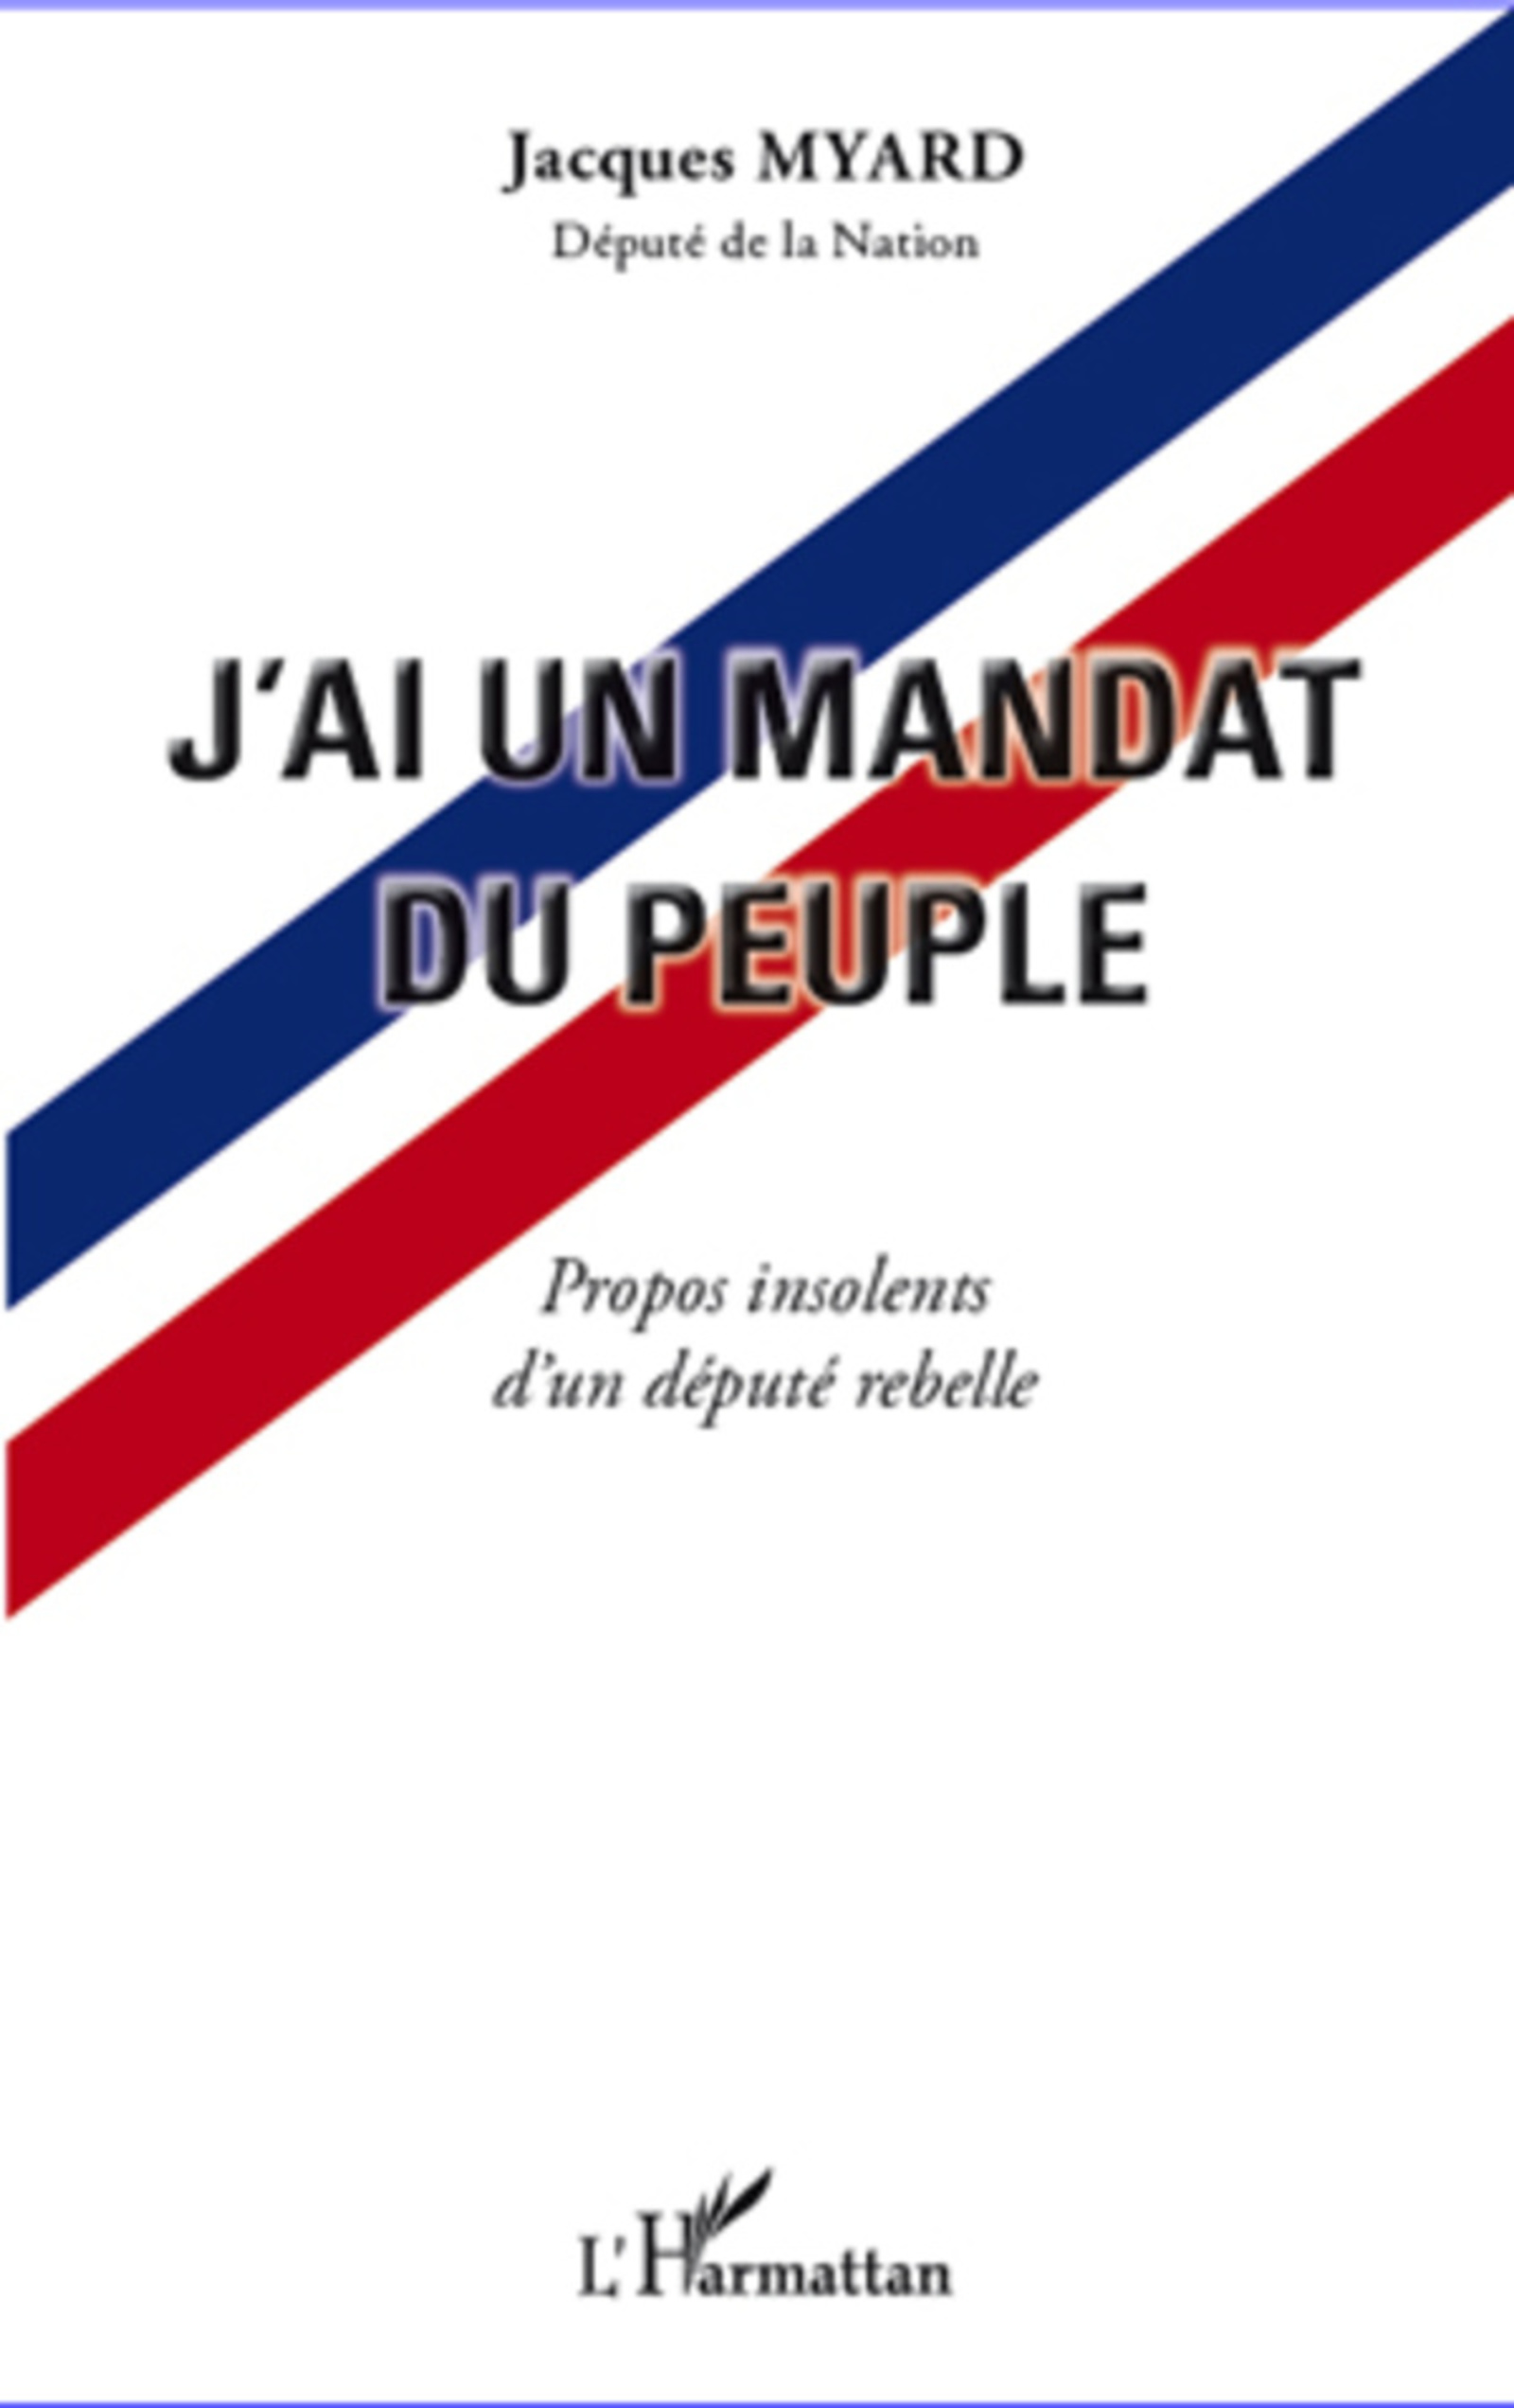 http://www.editions-harmattan.fr/catalogue/couv/9782296969735r.jpg